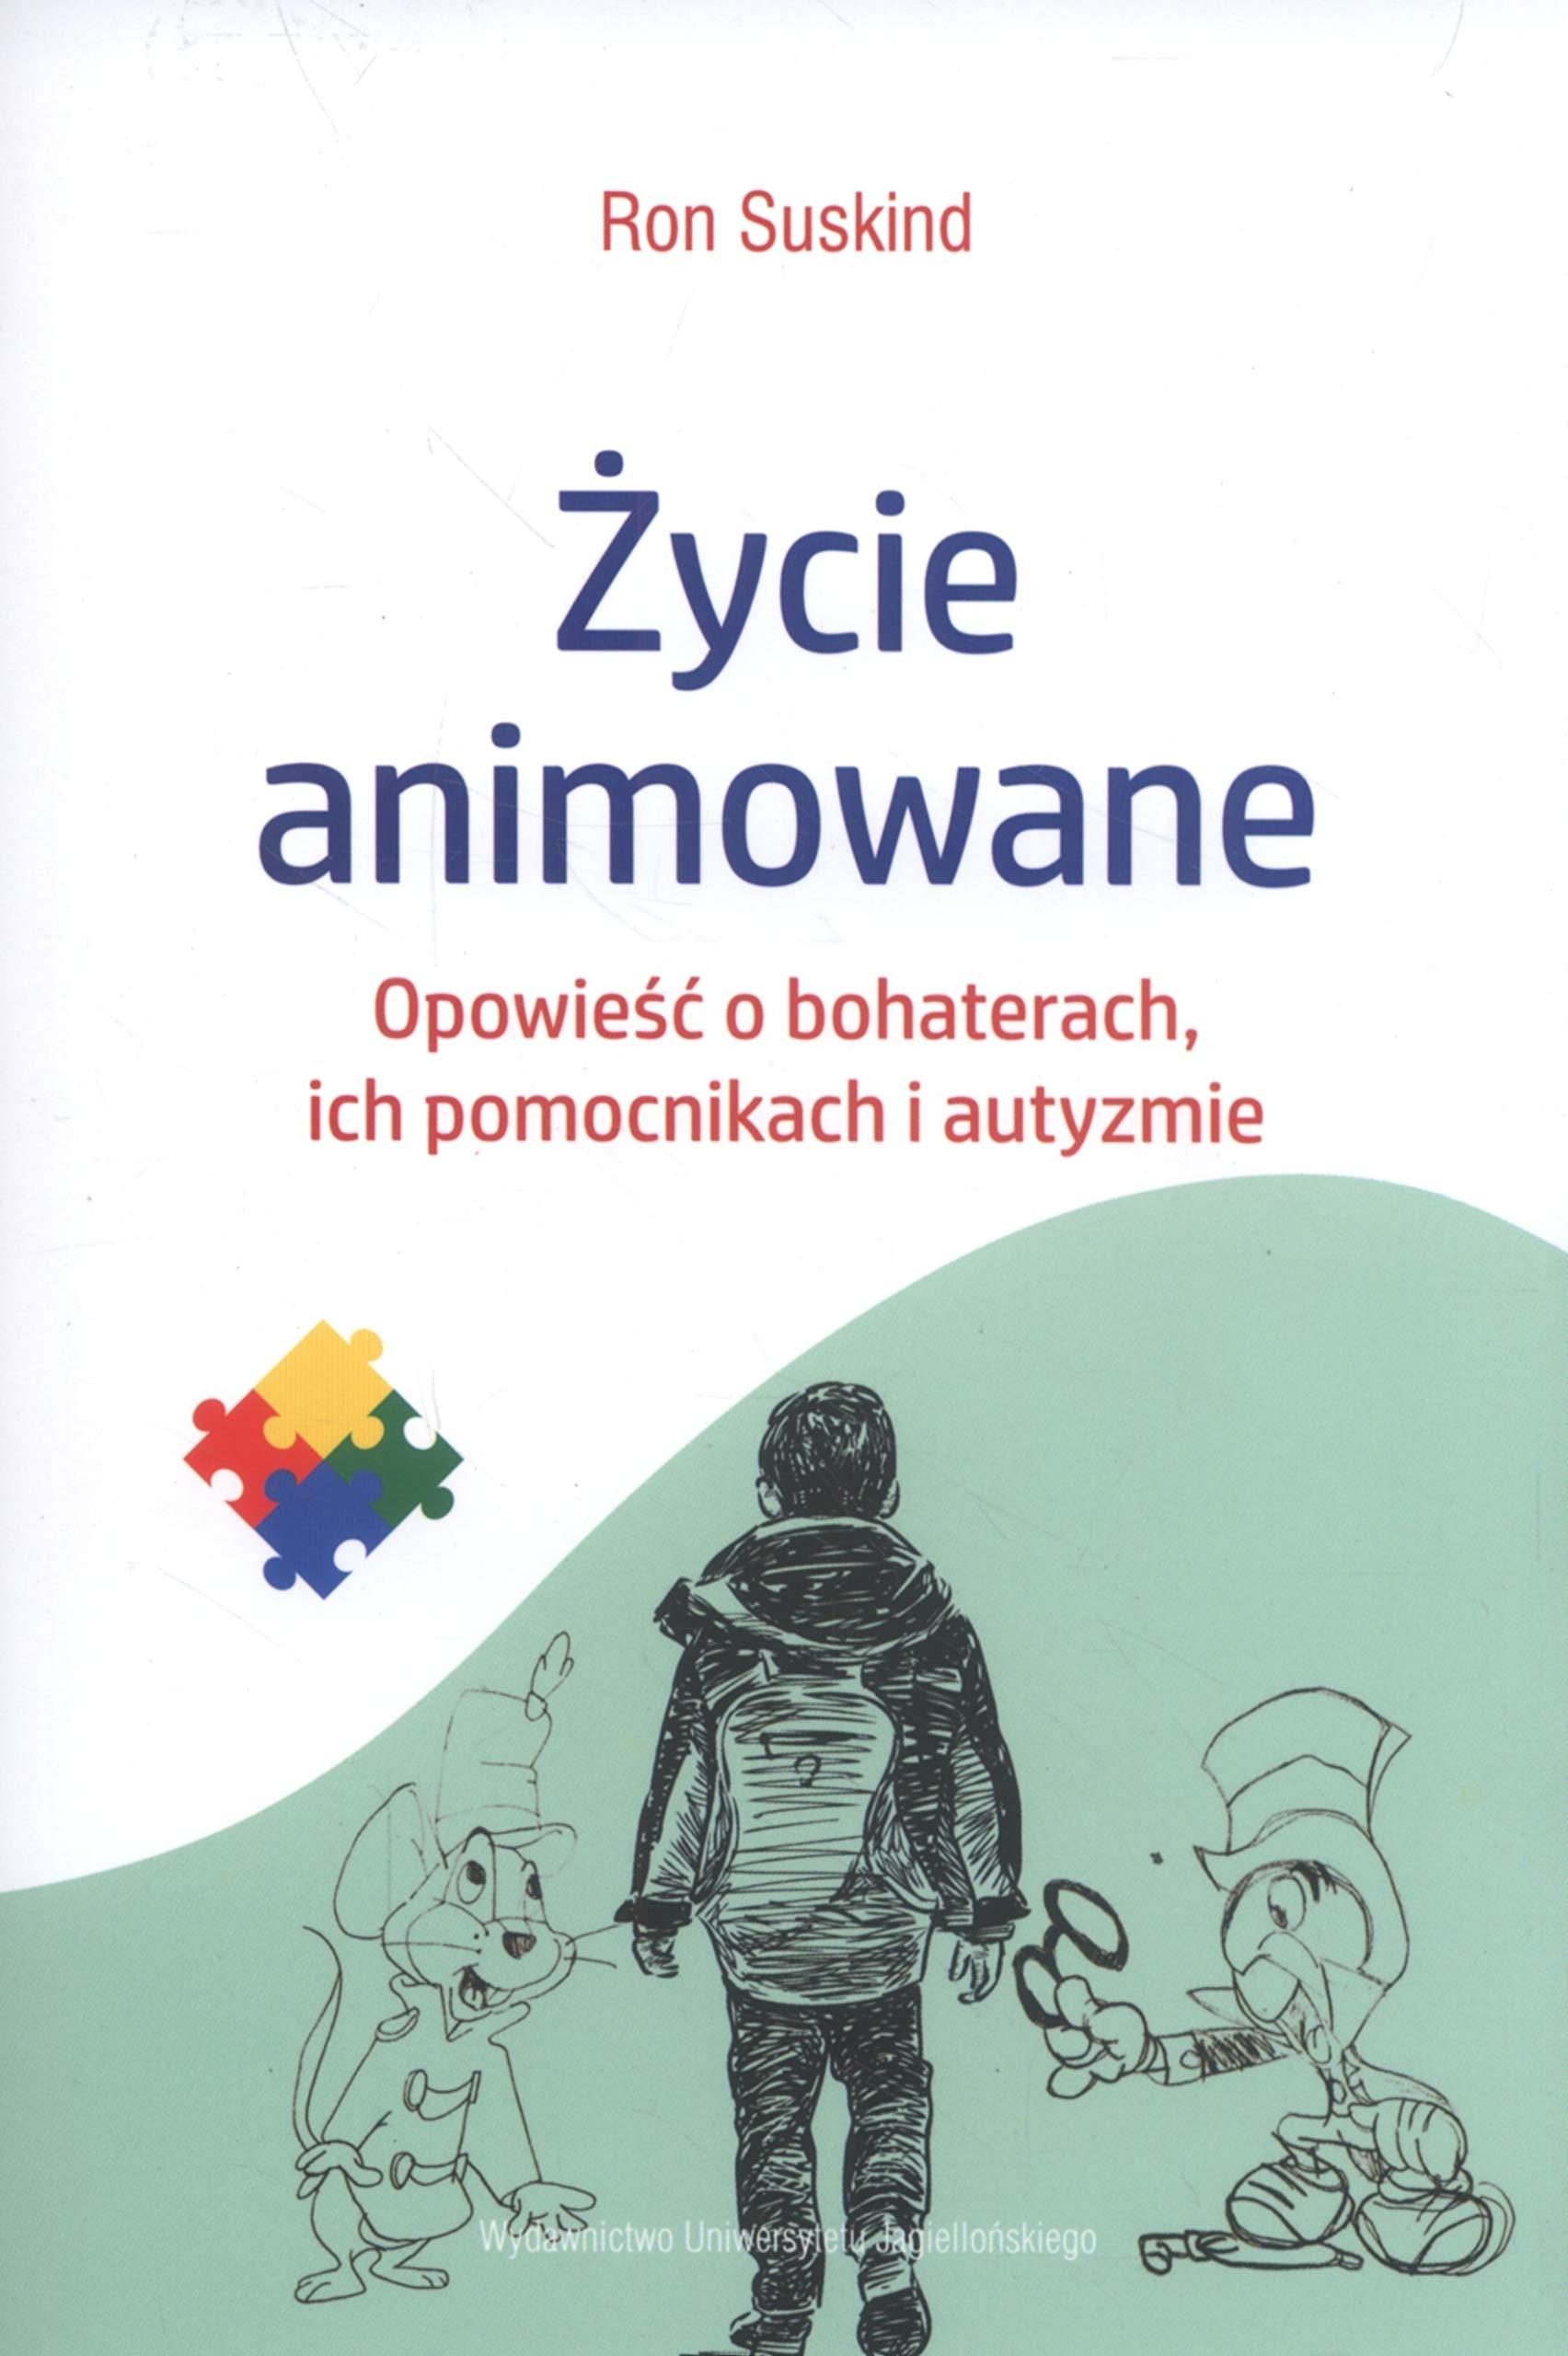 Zycie animowane: Amazon.es: Suskind, Ron: Libros en idiomas ...